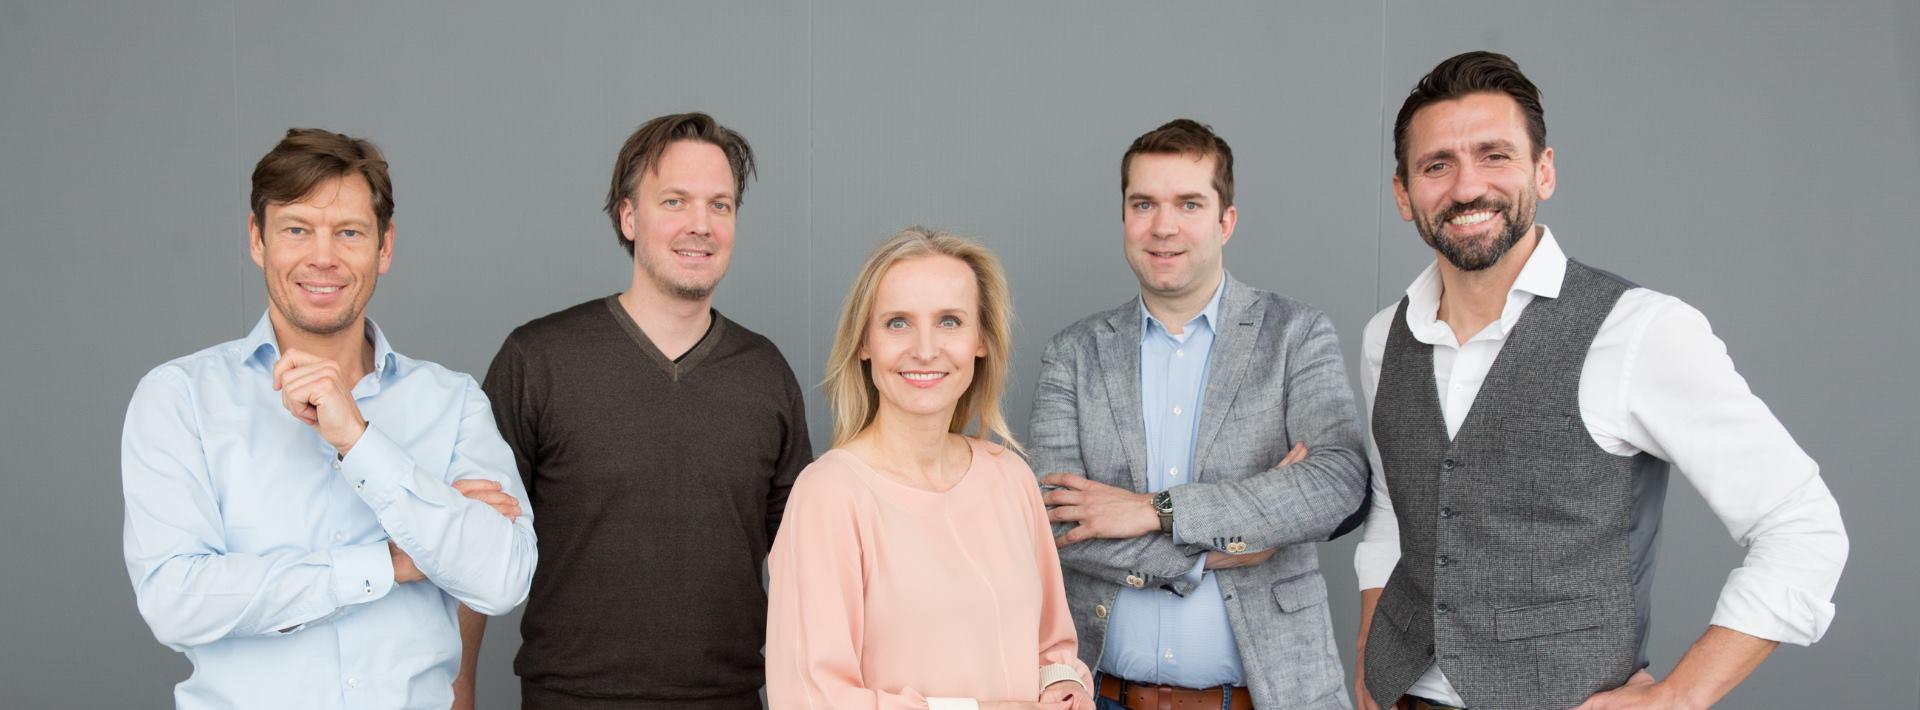 Grad Beč dobiva dva nova velika startup huba